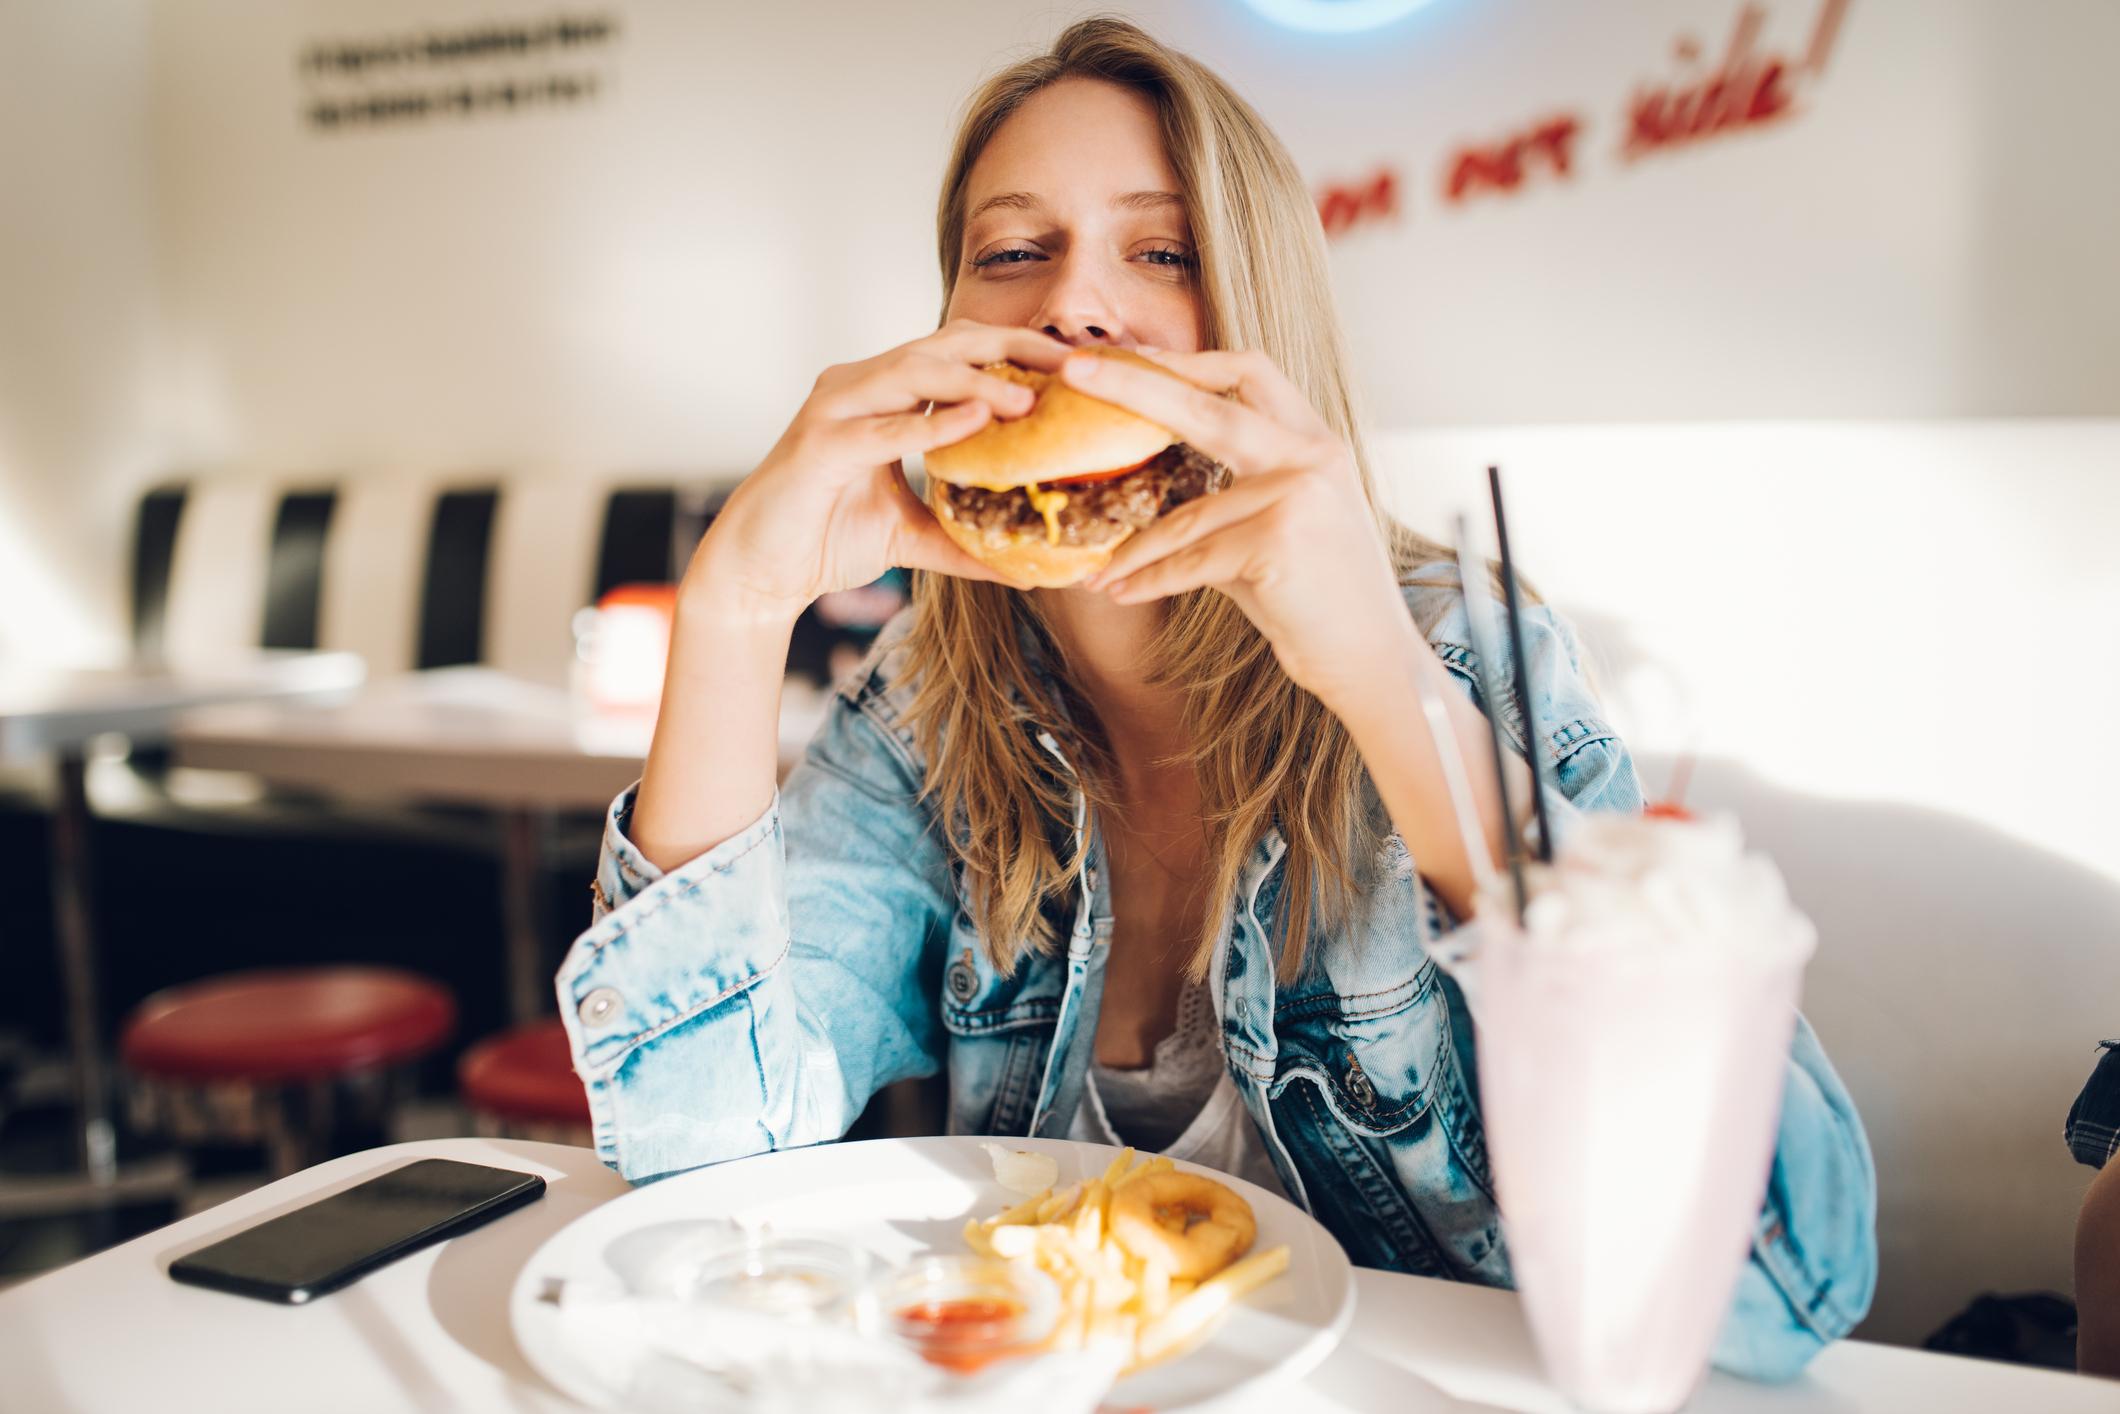 fast food fast casual hamburger milkshake getty